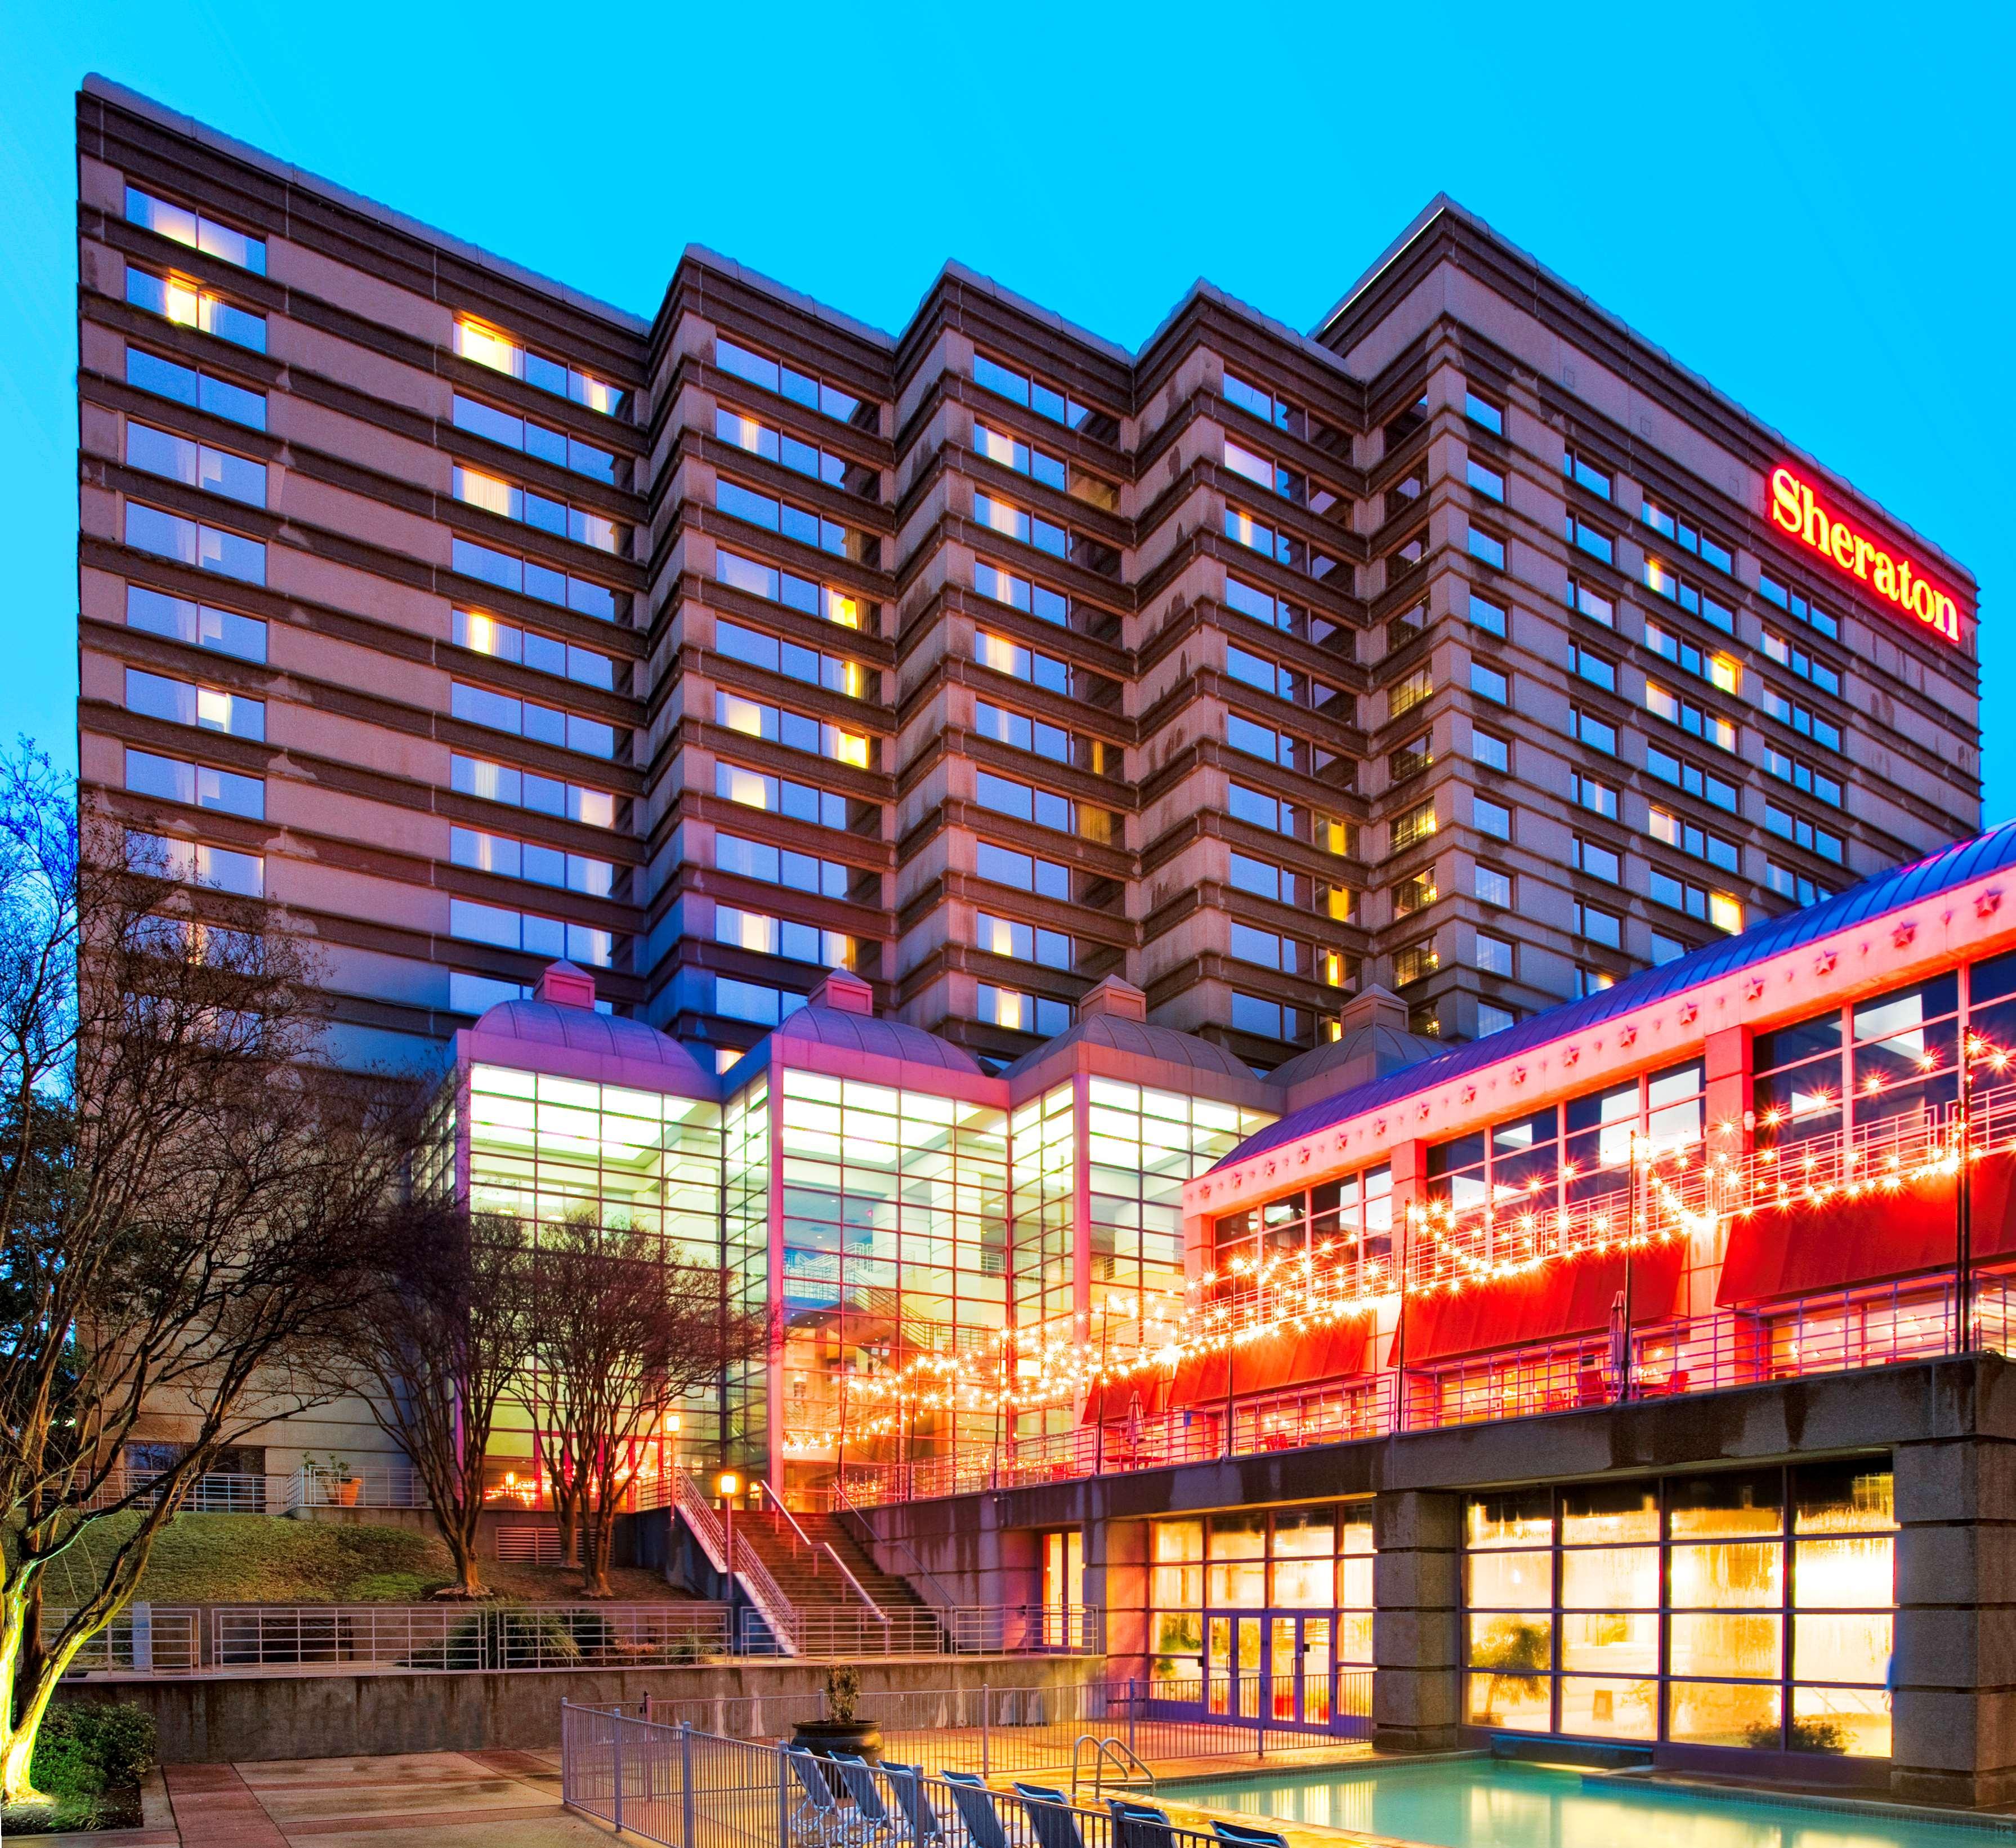 Sheraton Hotel Austin Tx